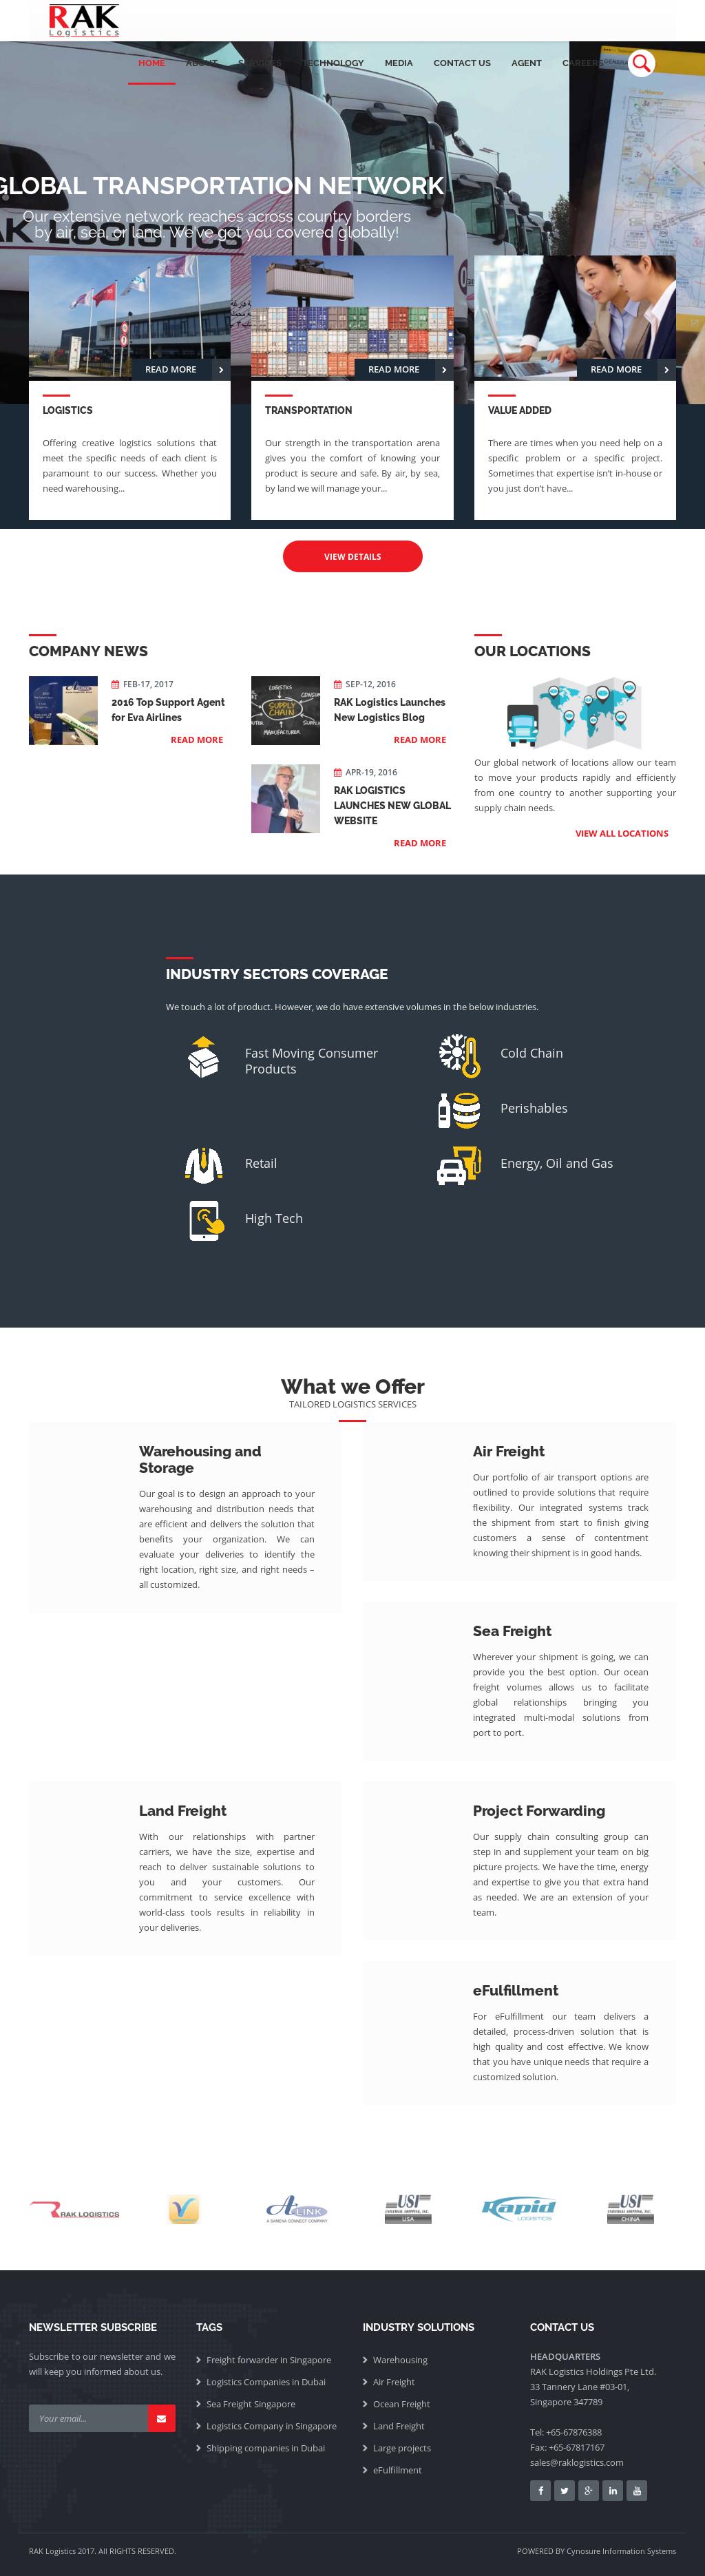 Rak Logistics Competitors, Revenue and Employees - Owler